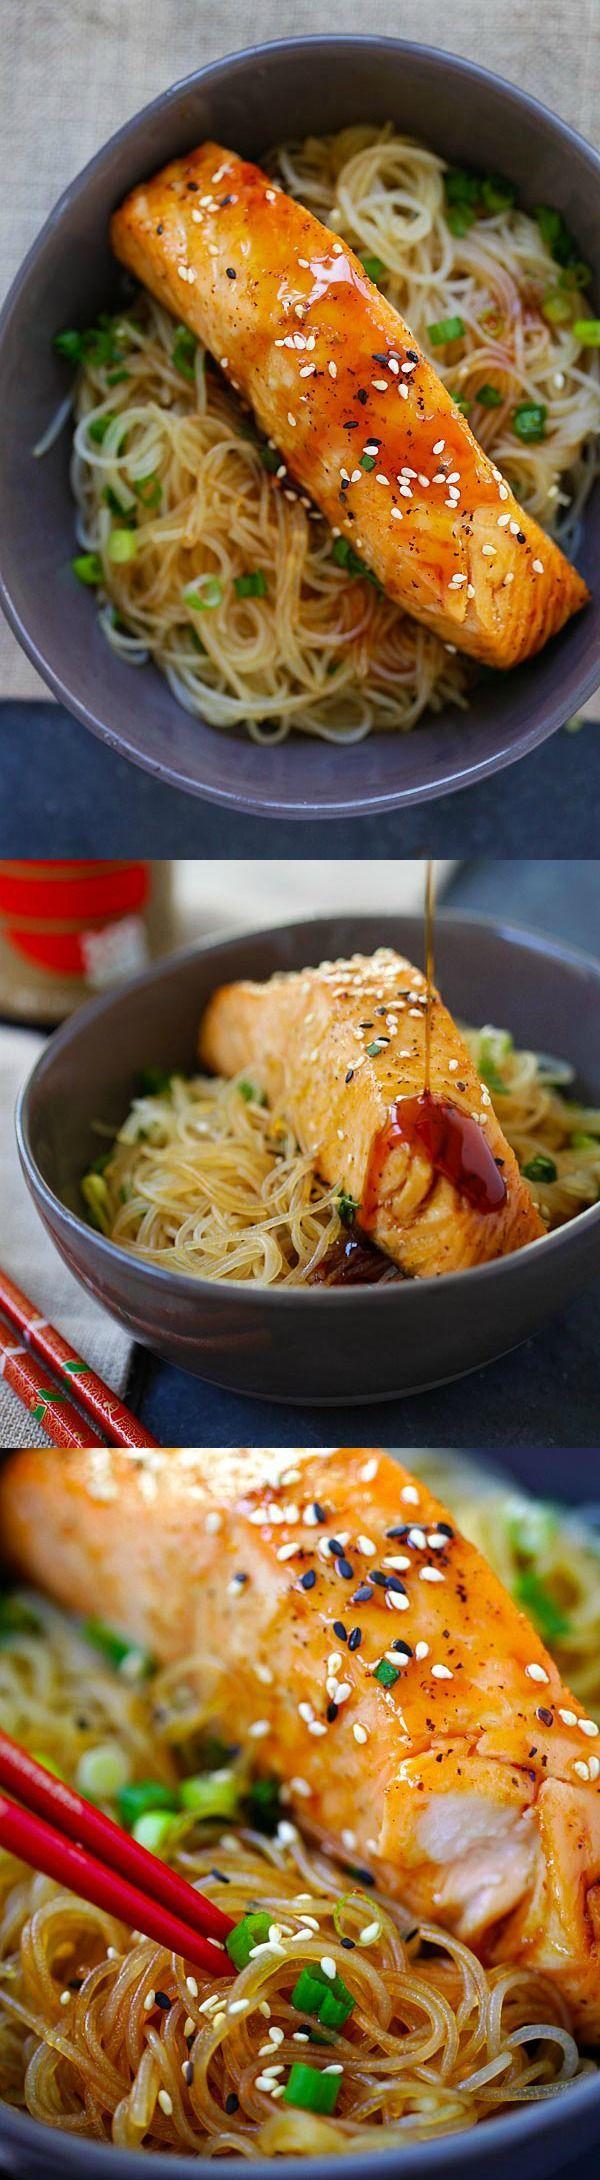 Salmon Teriyaki Noodles – moist and juicy salmon and rice noodles